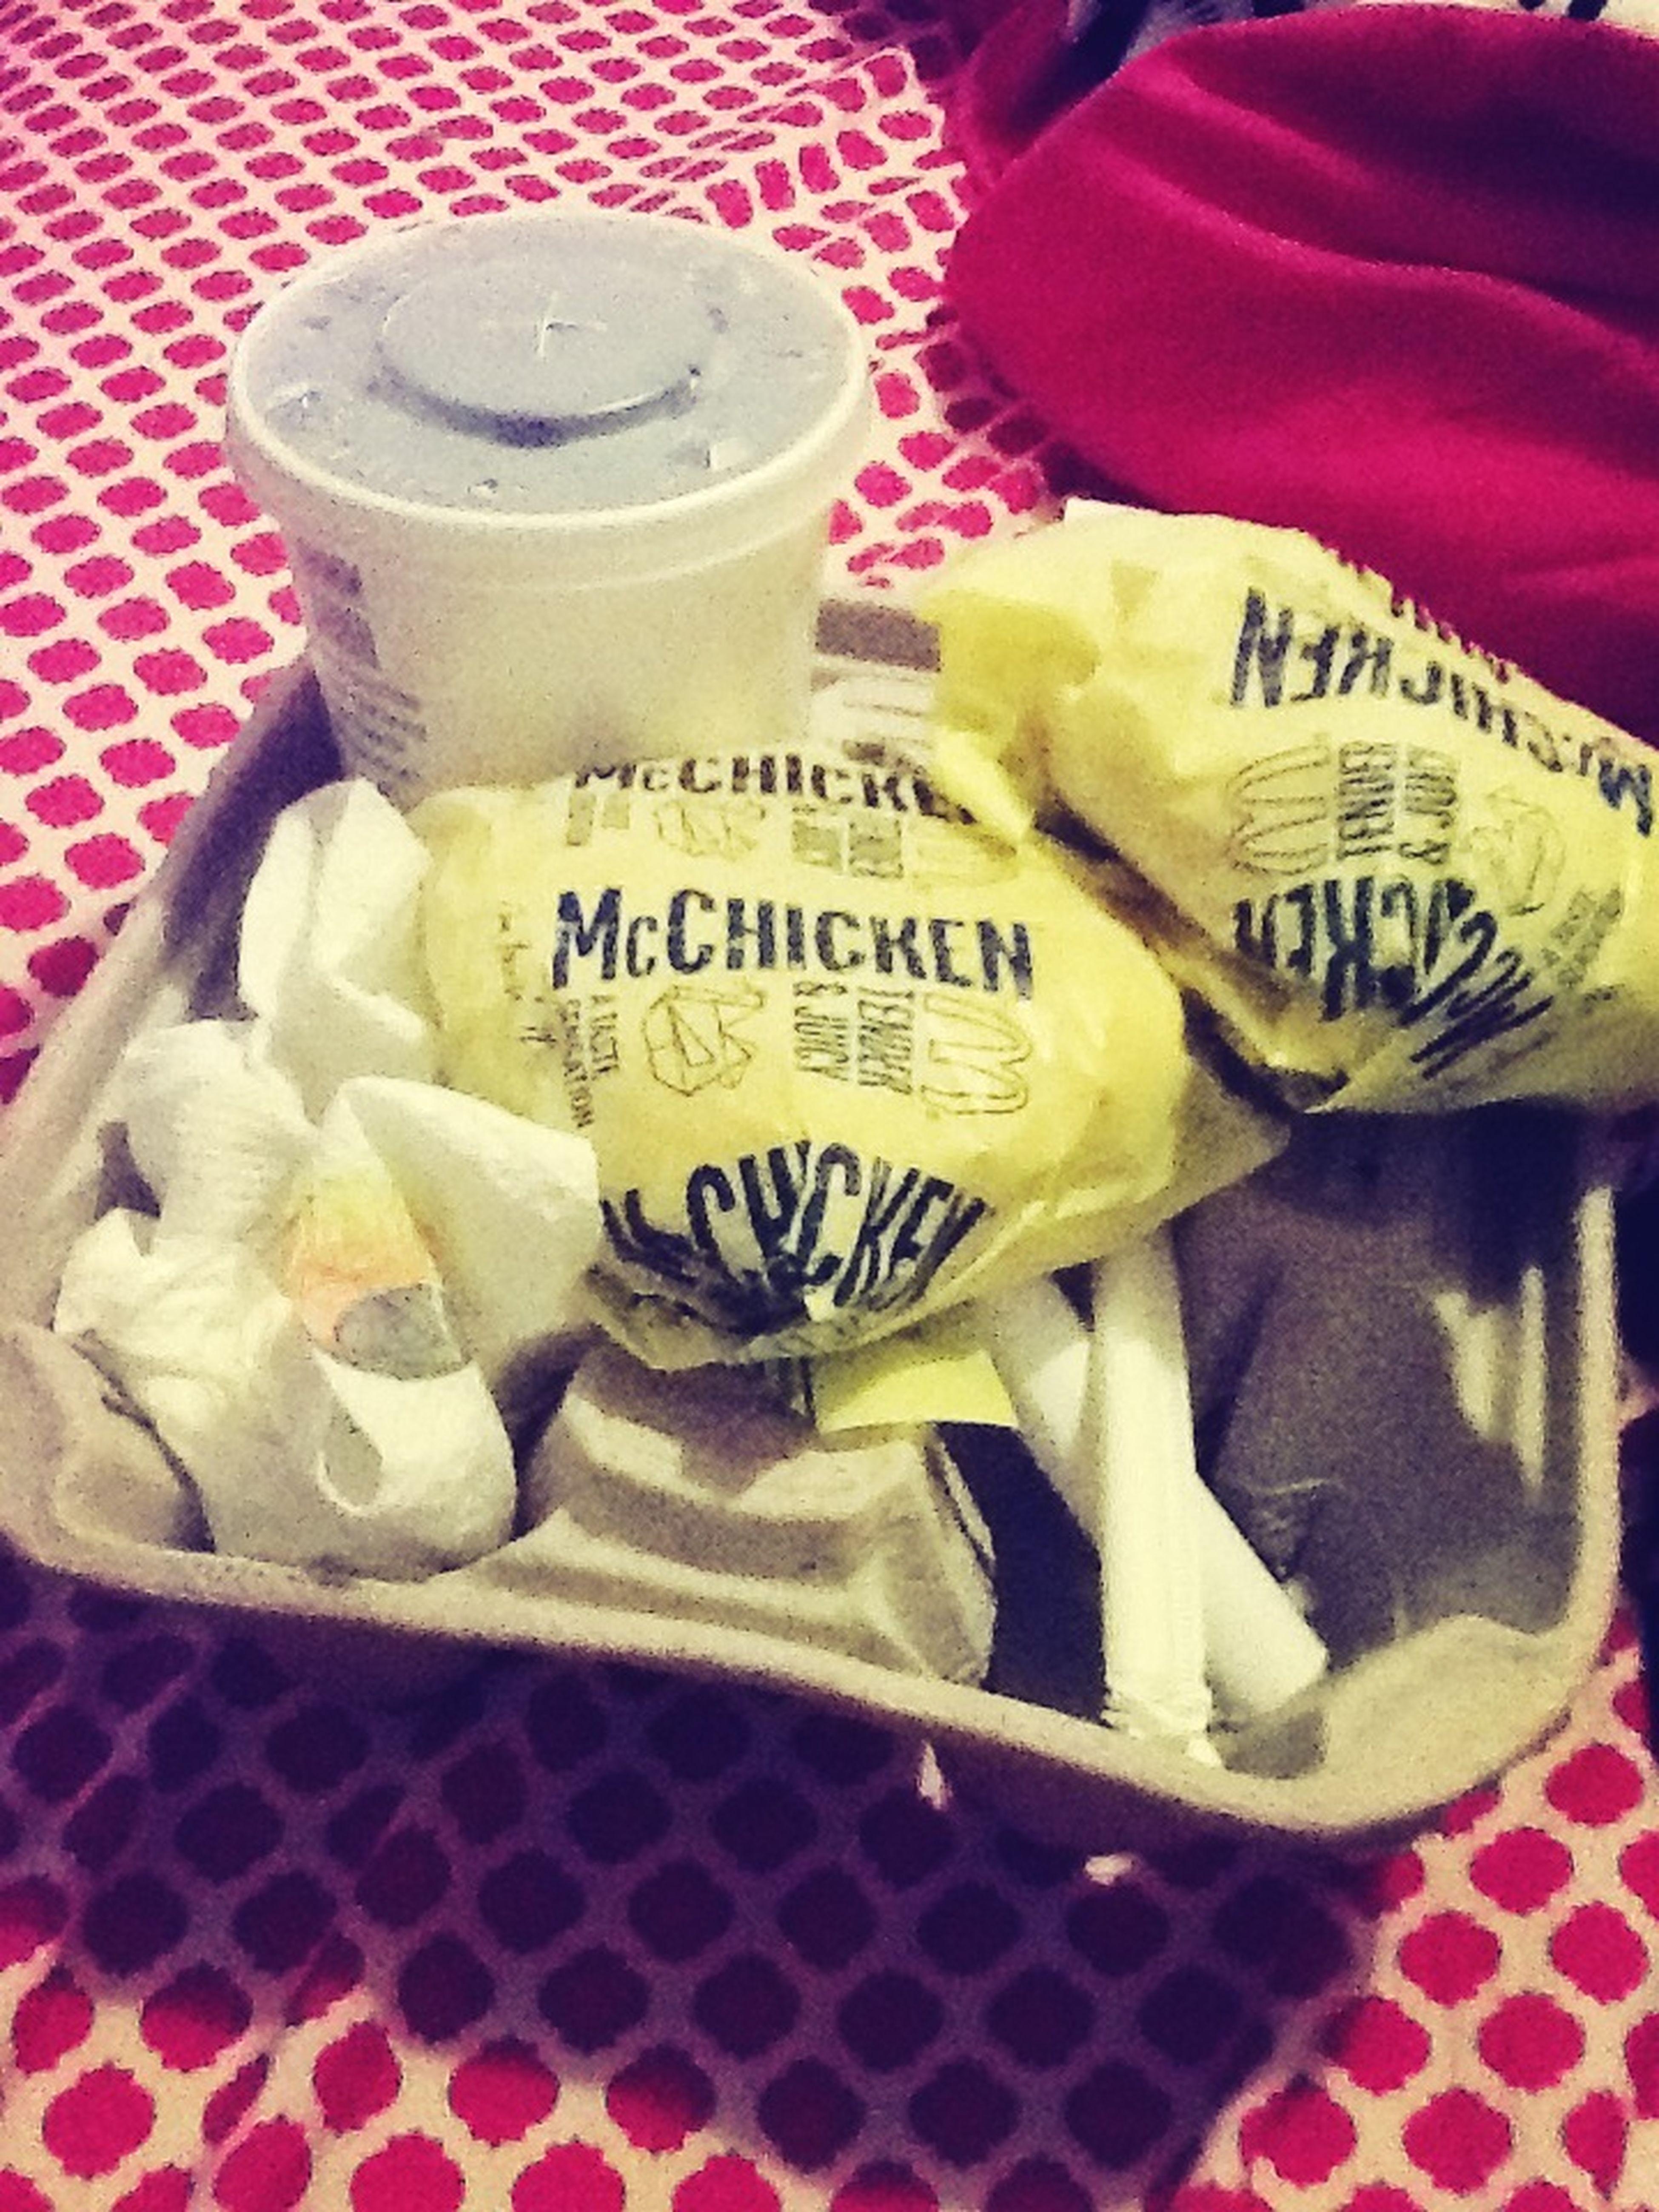 My Bro Bought Me Food :)